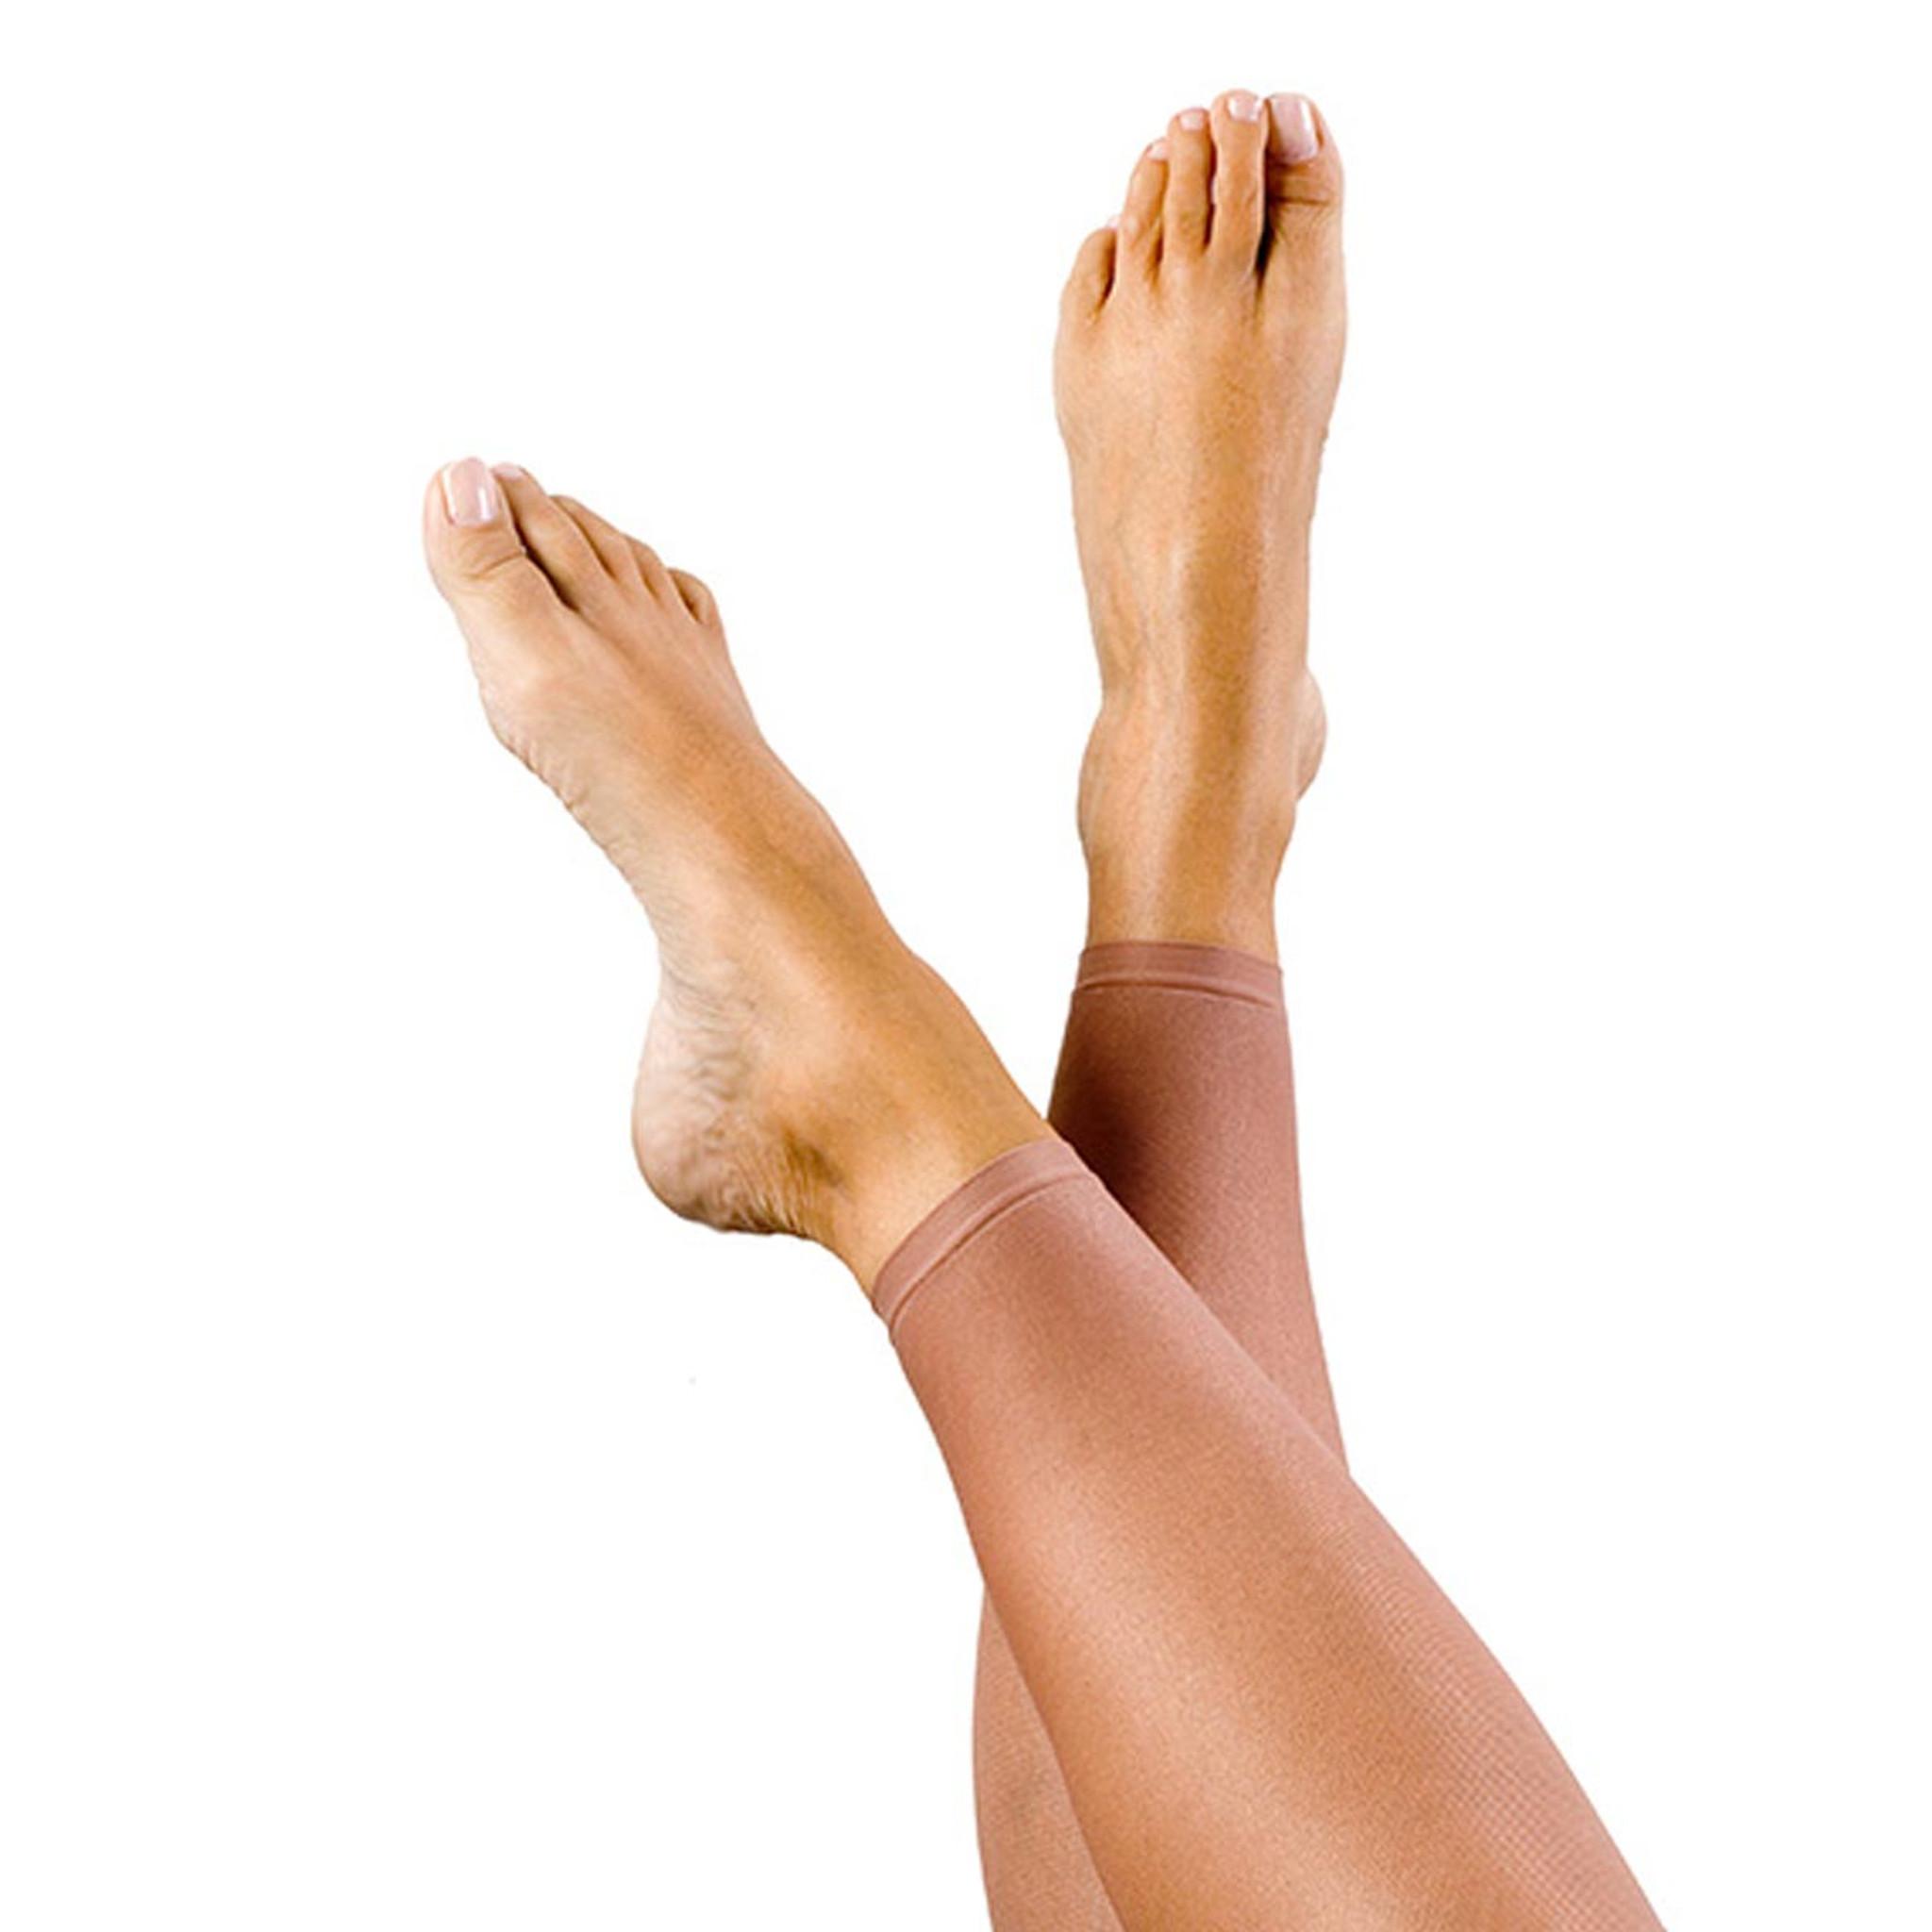 02a2d5d0d8bd3 Ladies Original Shimmer Gloss Footless Tights by Fiesta Legwear Style No.